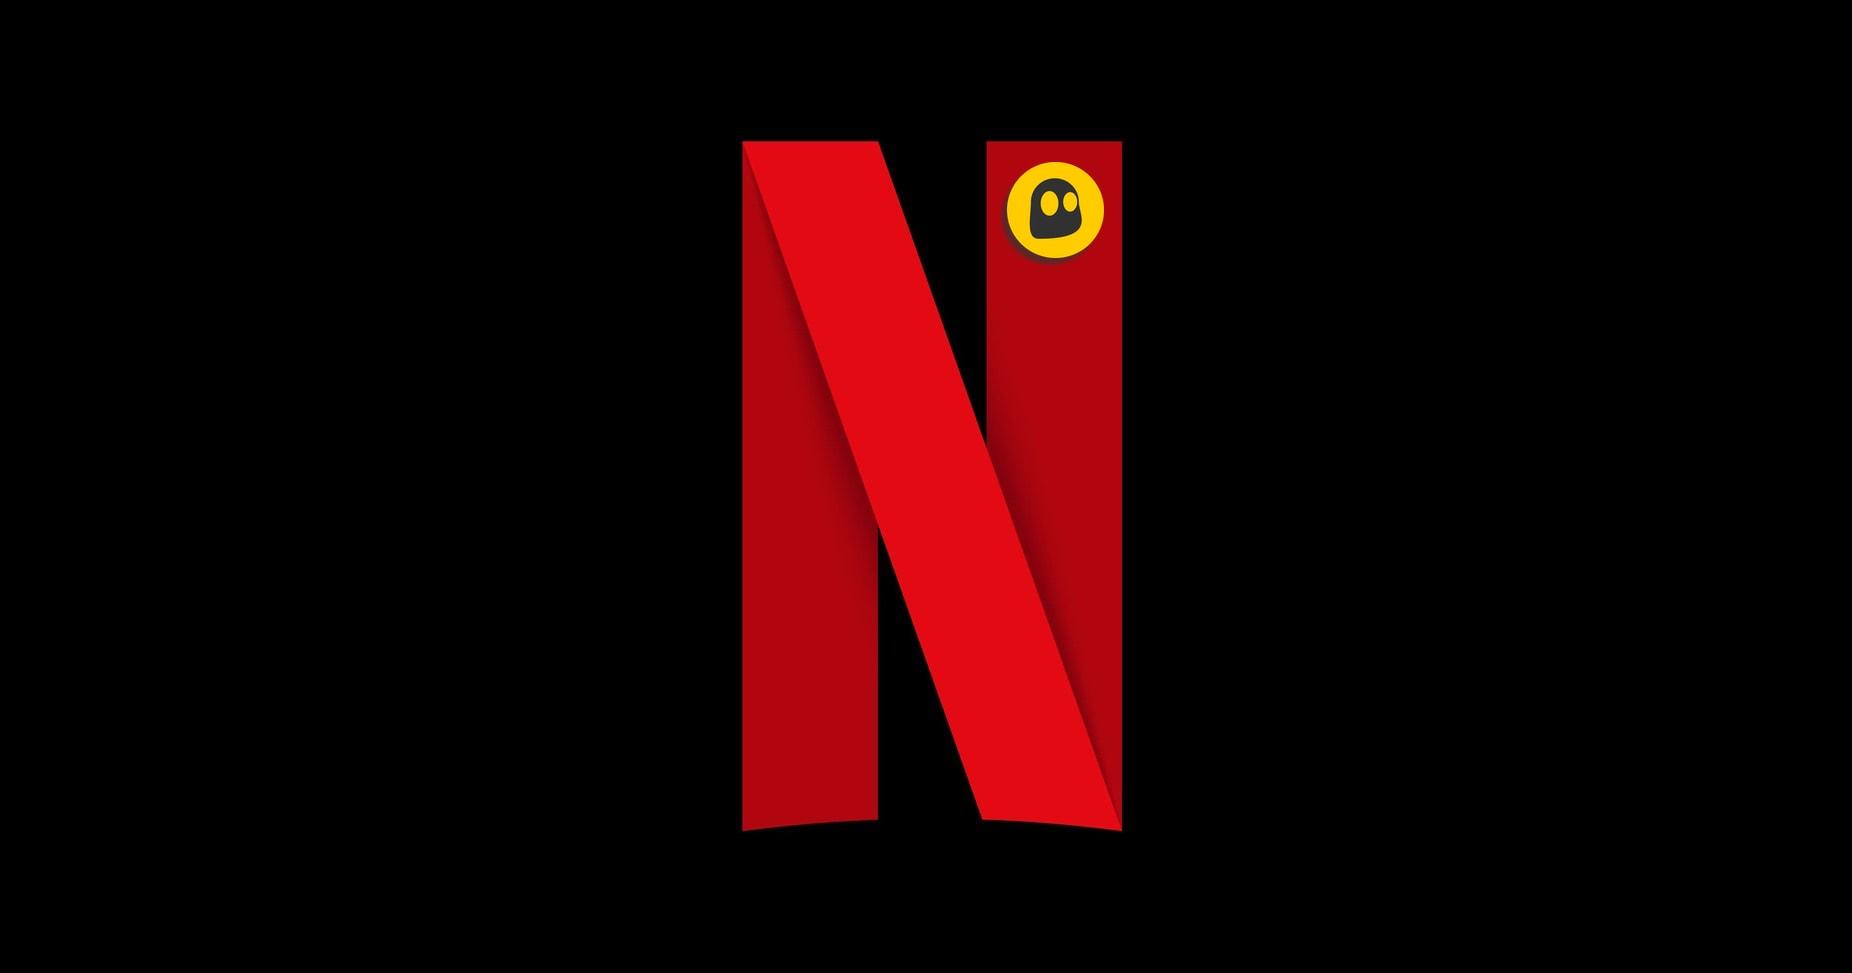 CyberGhost Netflix Featured